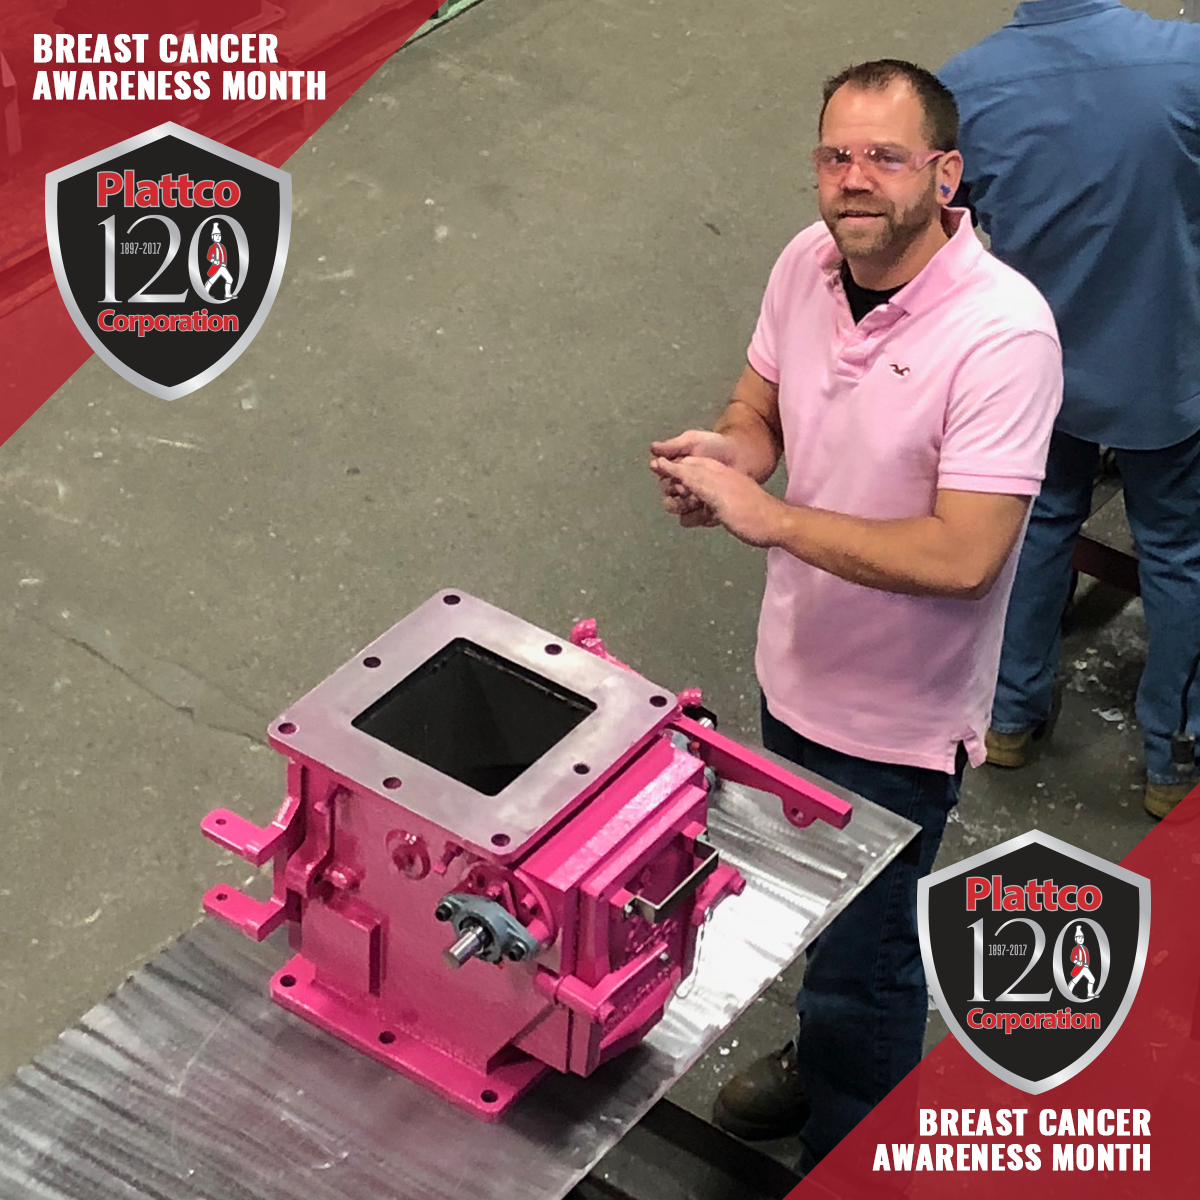 Plattco staff wearing pink